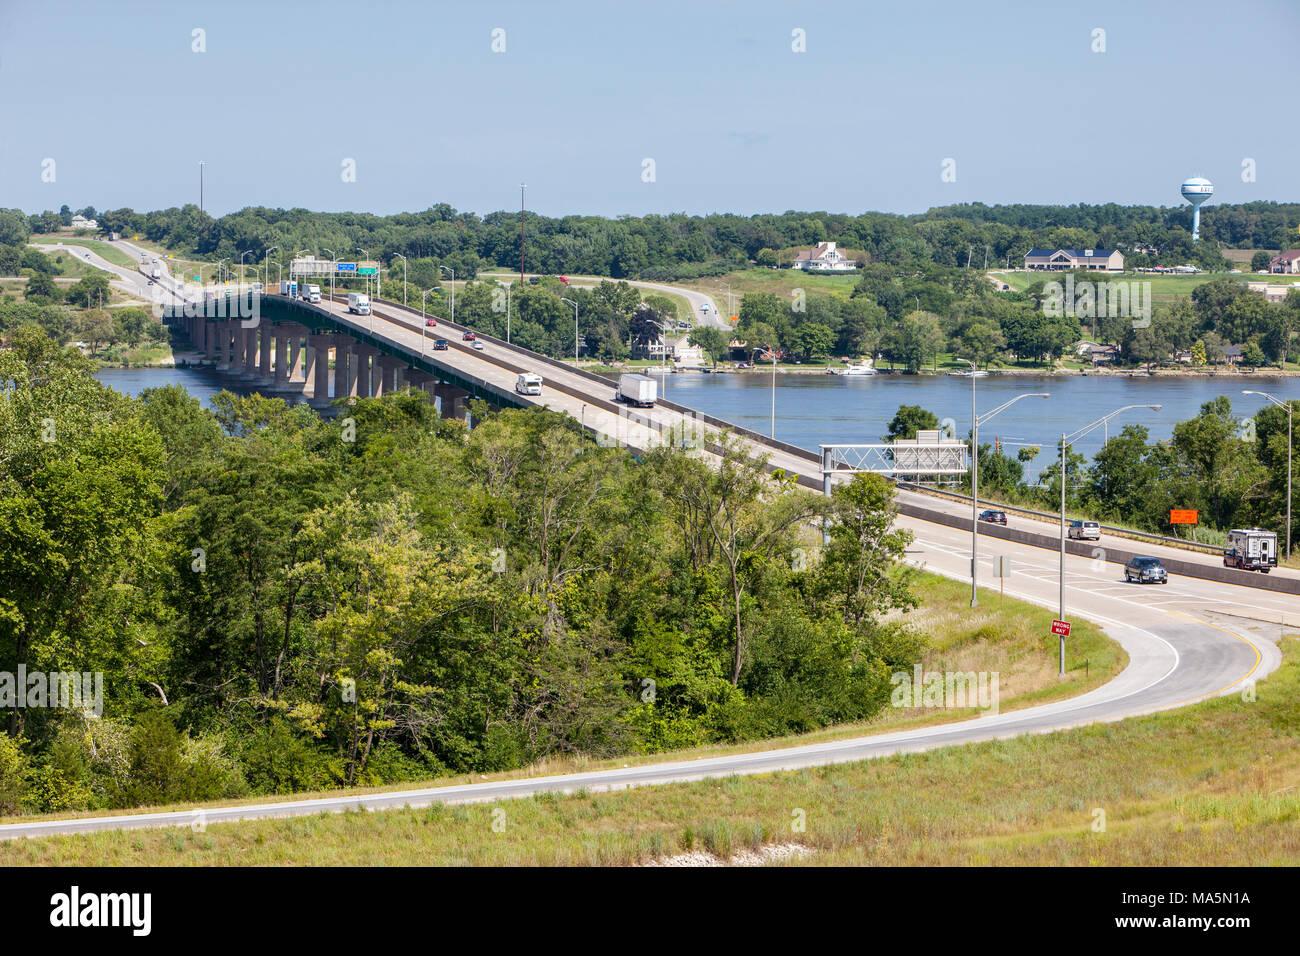 Mississippi River Bridge, US Interstate 80 Highway, Le Claire, Iowa